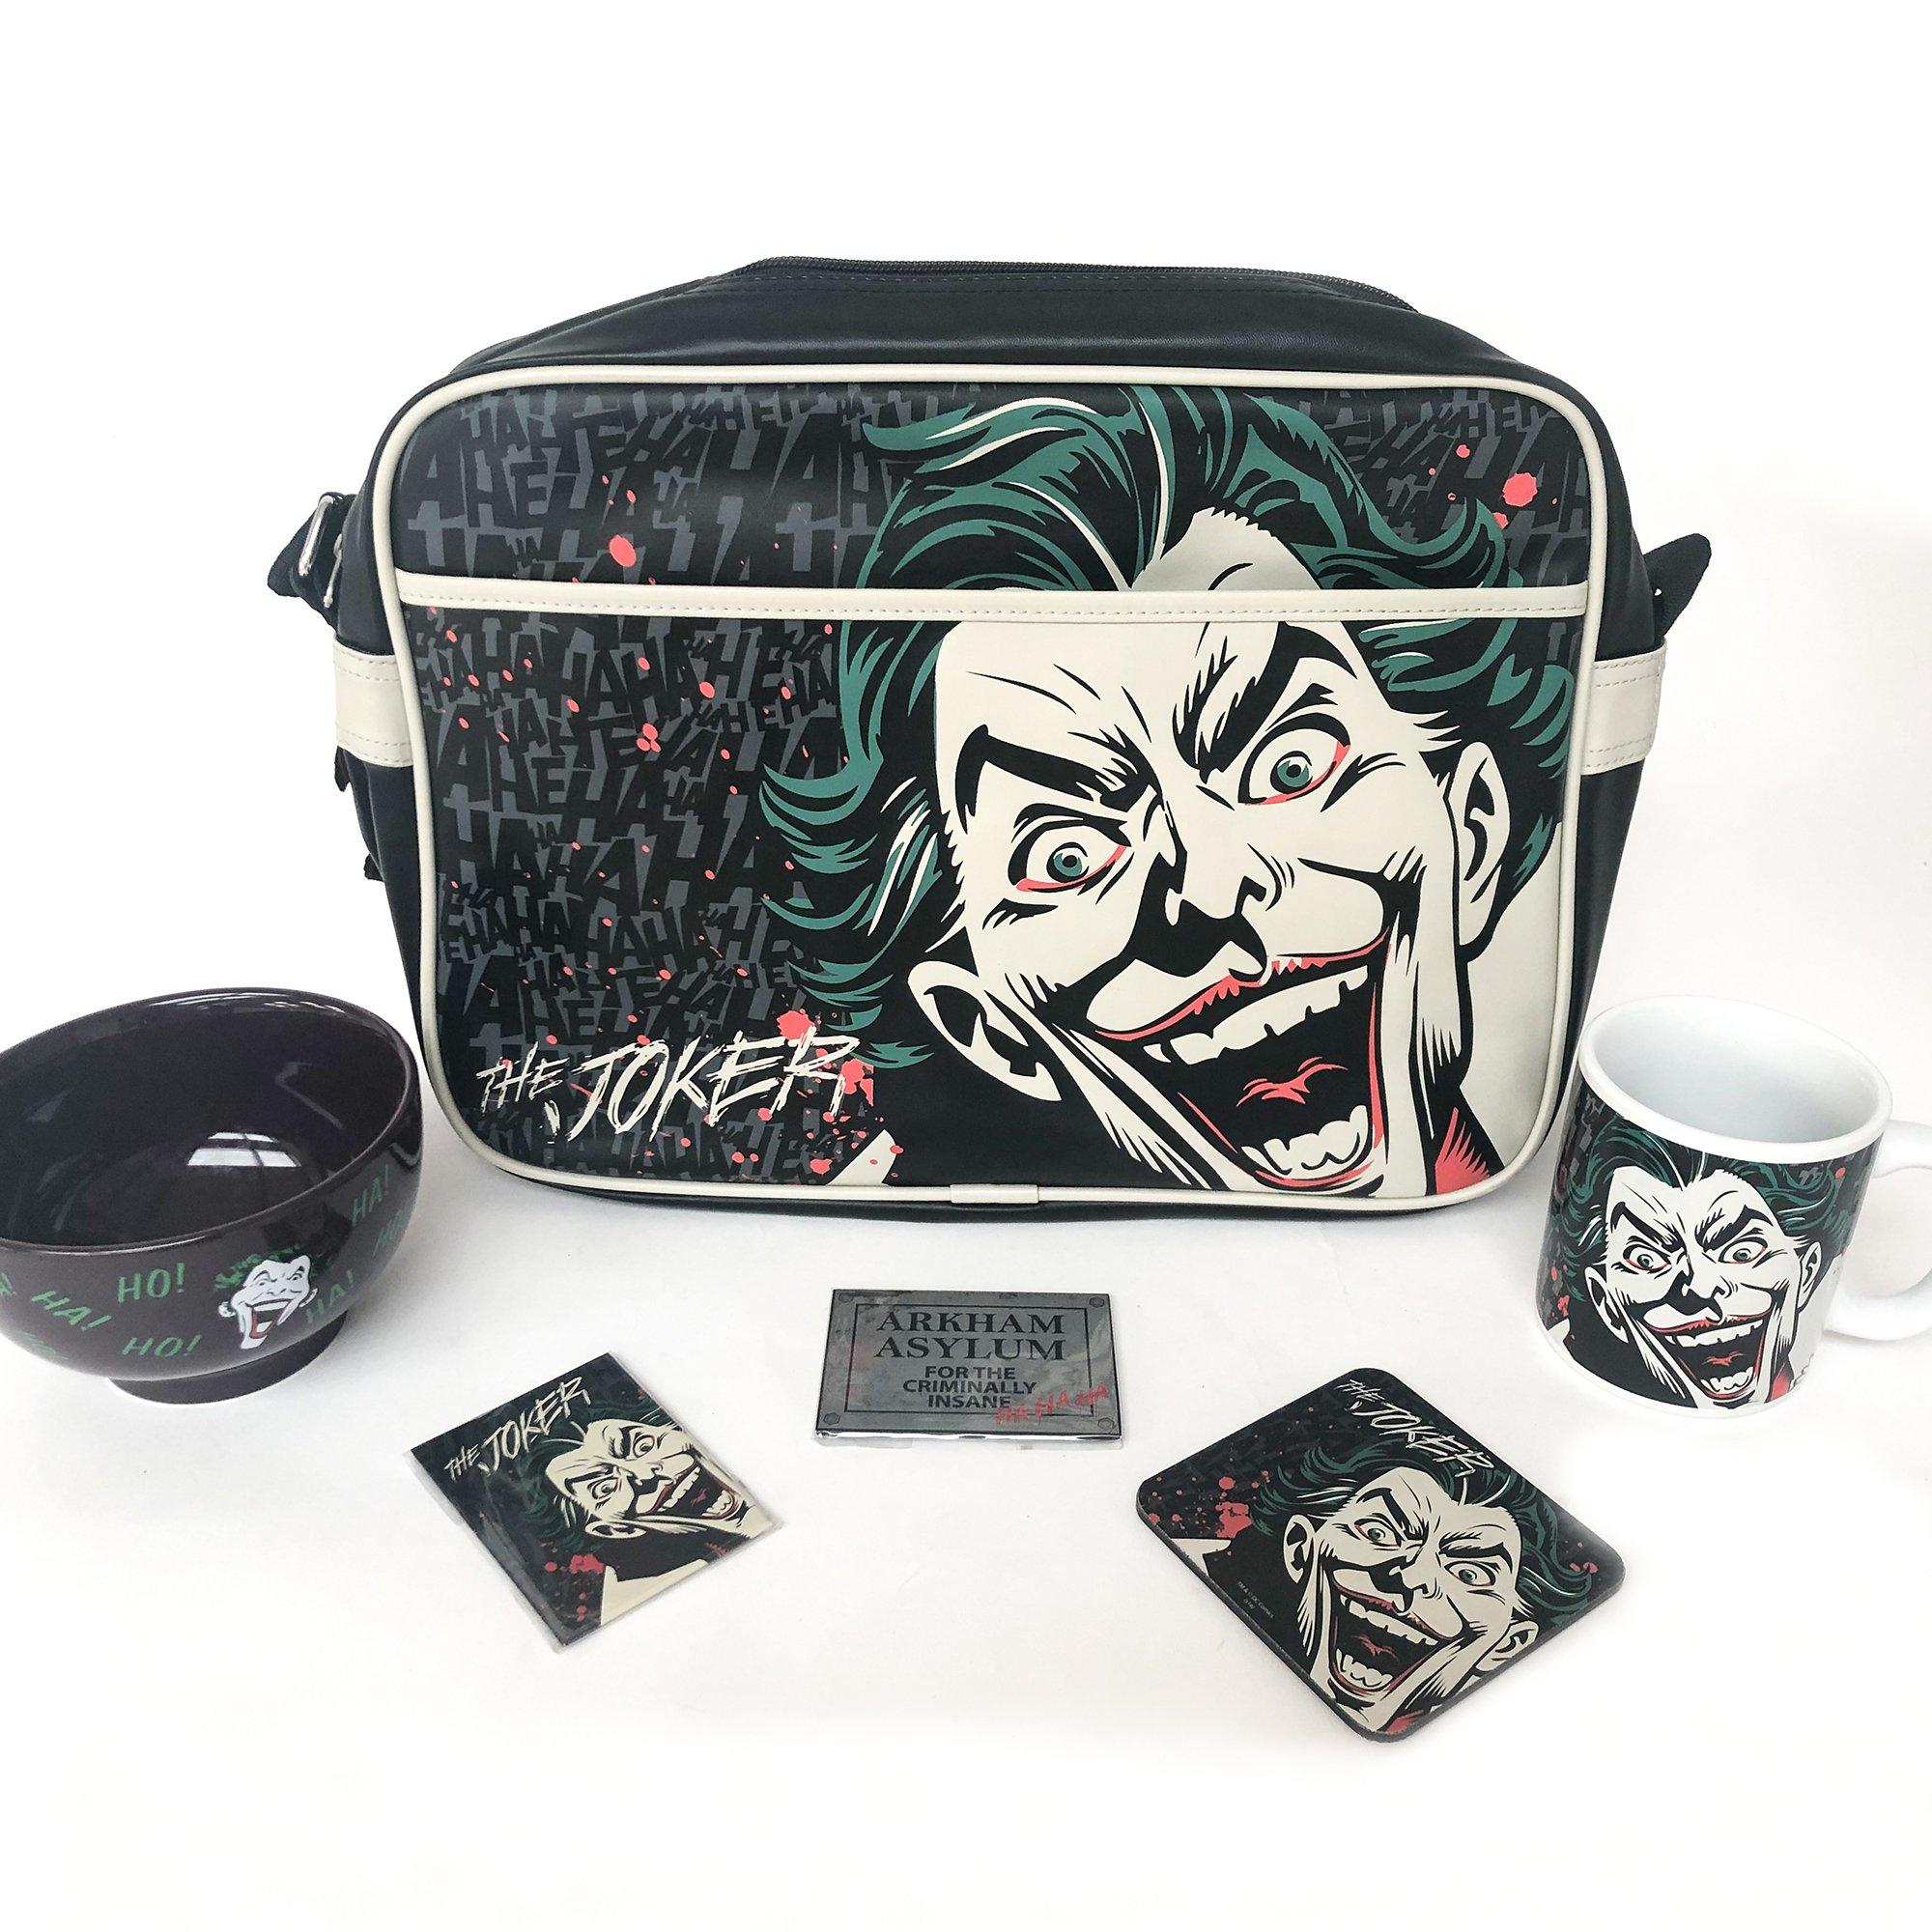 Web Exclusive - Joker Bundle £29.99 + 10% off via TOTUM @ Half Moon Bay